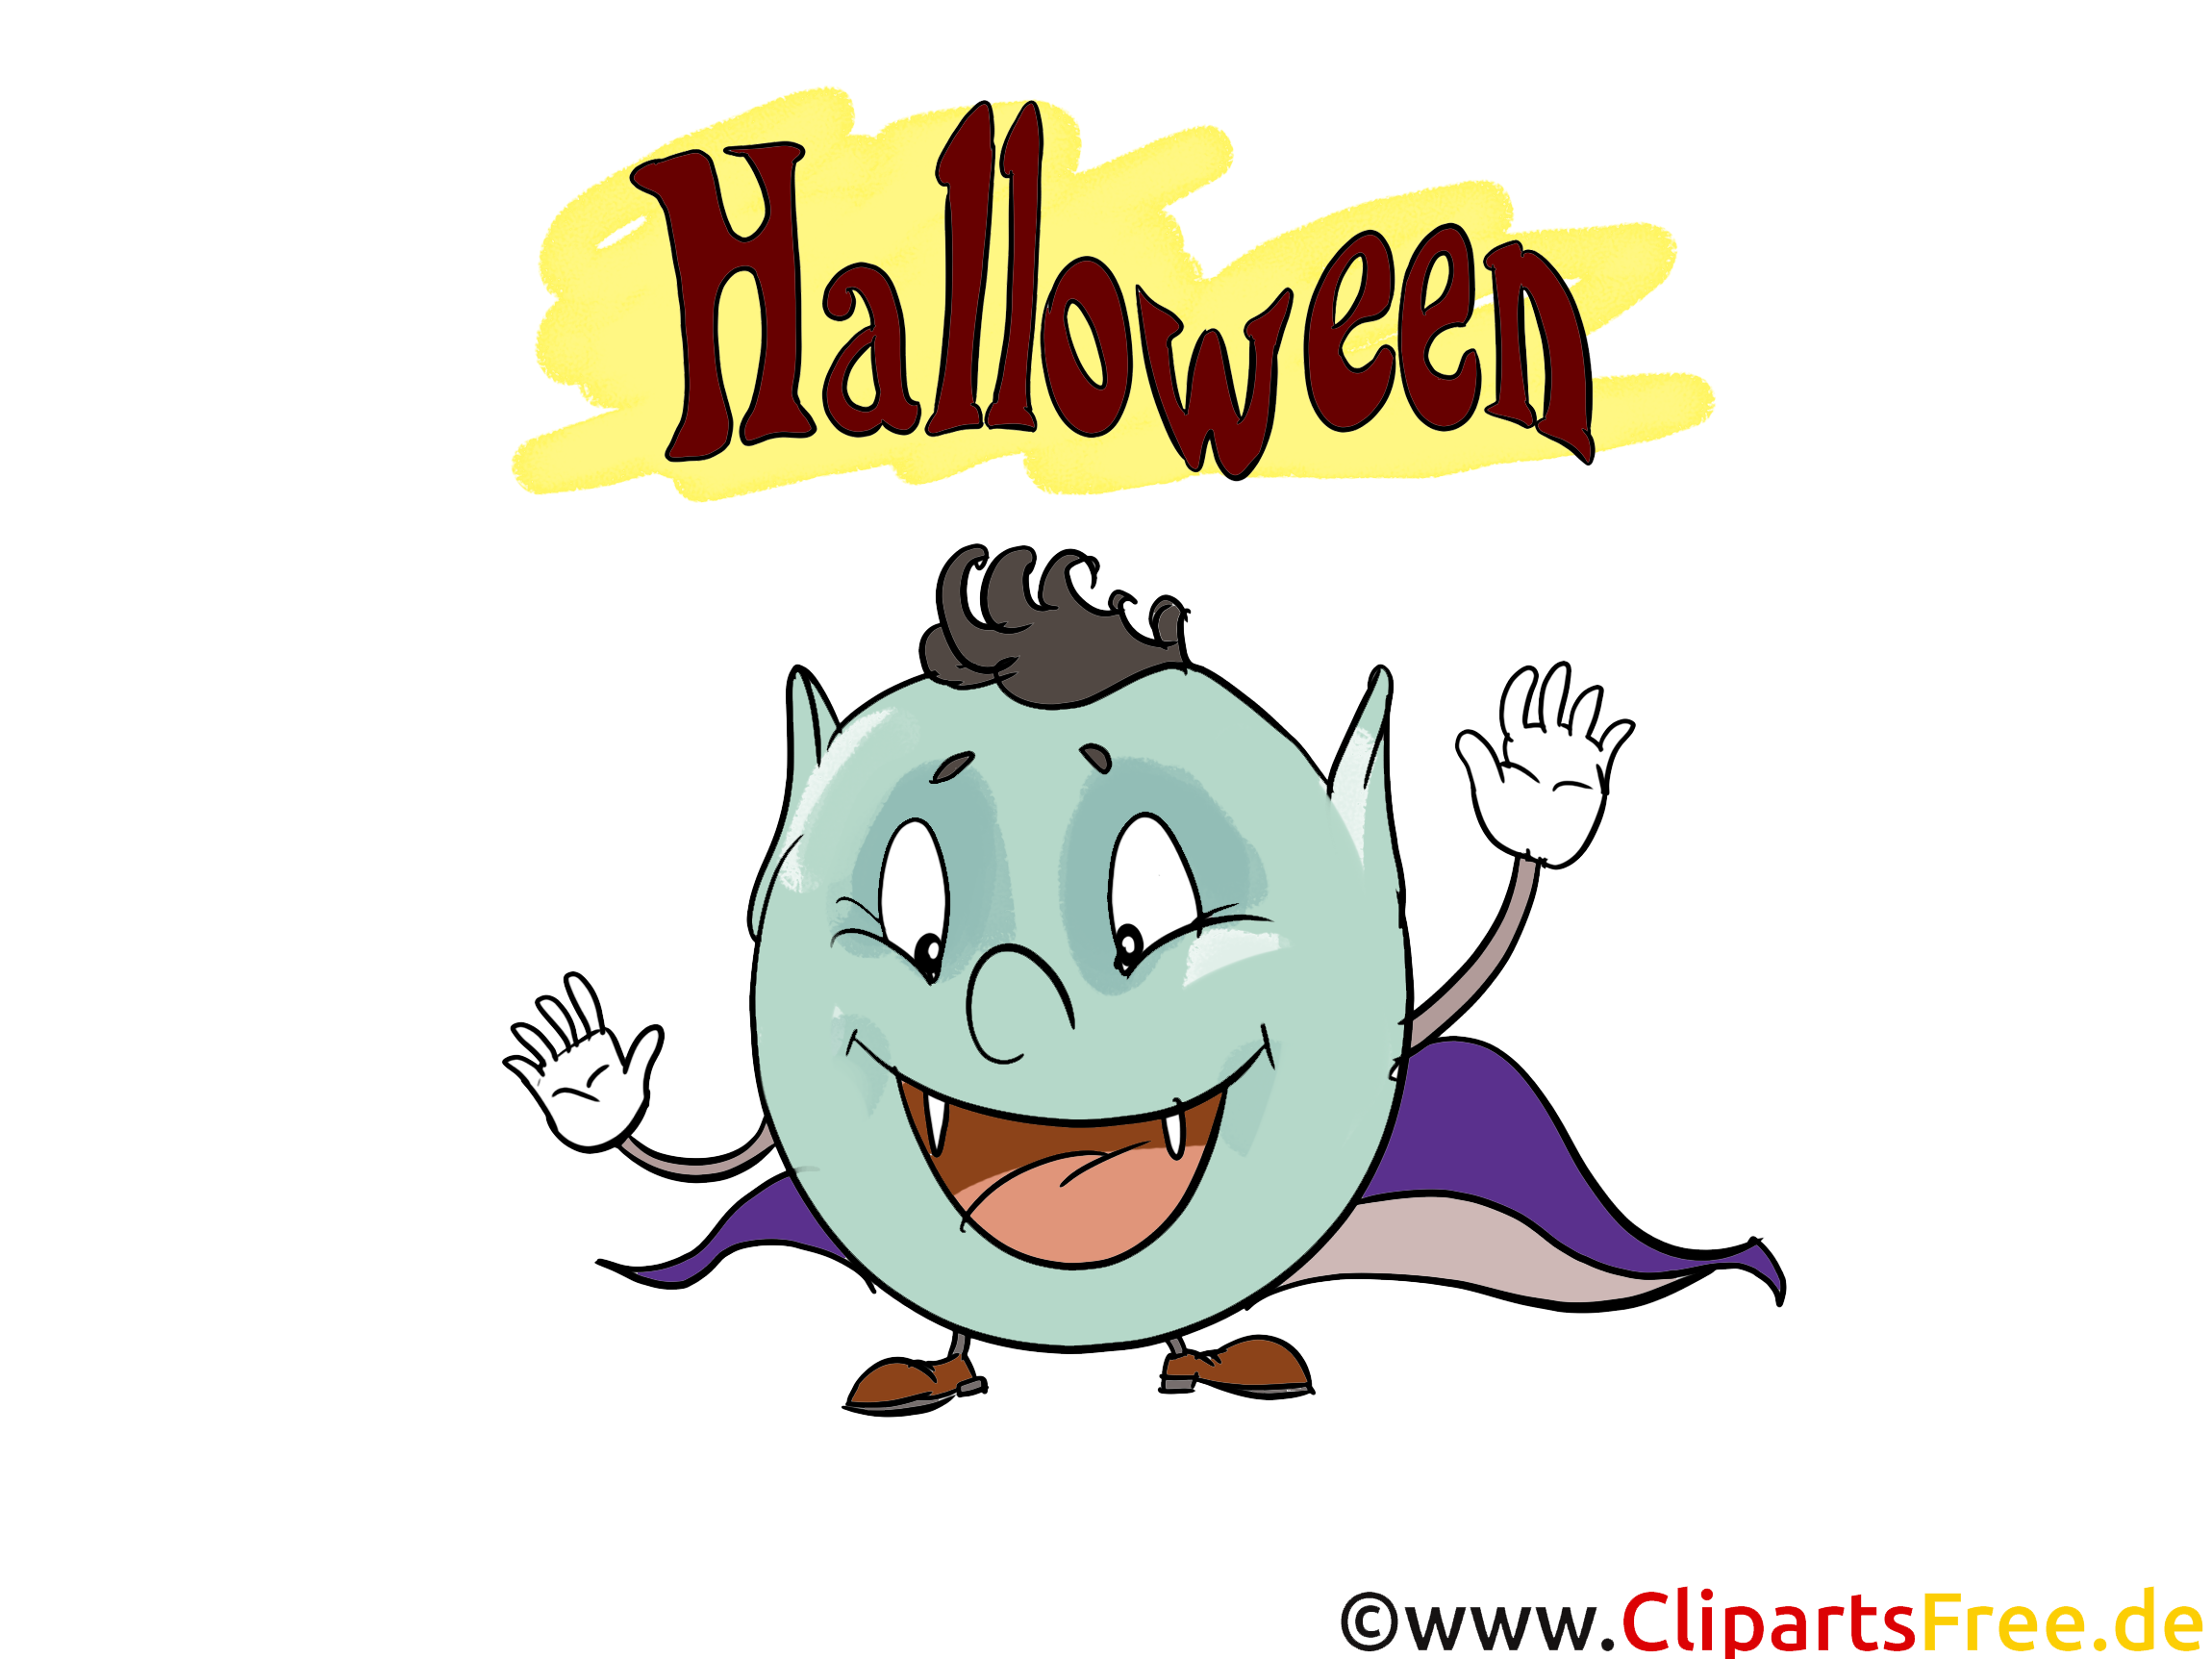 Halloween Maske - Illustrationen, Bilder, Grafiken, Cliparts, Comics, Cartoons zu Halloween